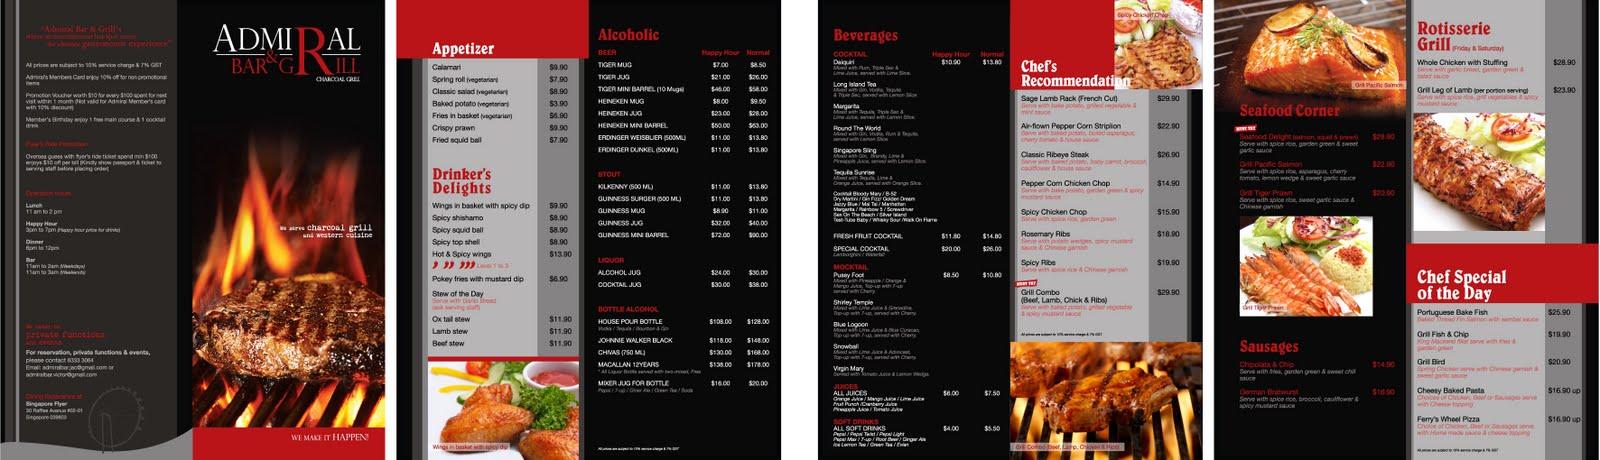 Purestateofmine purestateofmind admiral bar grill menu for Table 52 drink menu